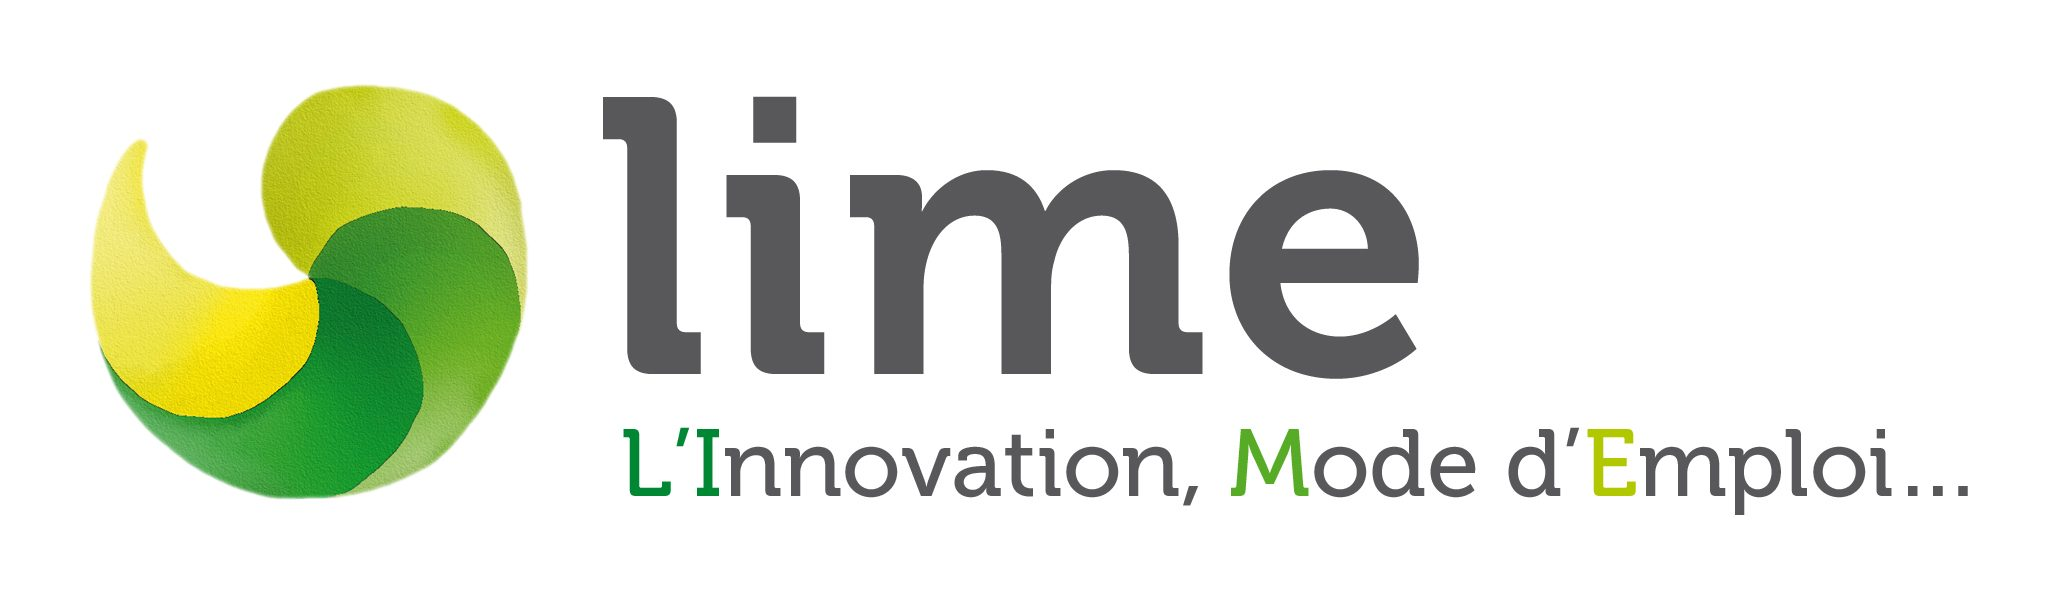 LIME Innovation